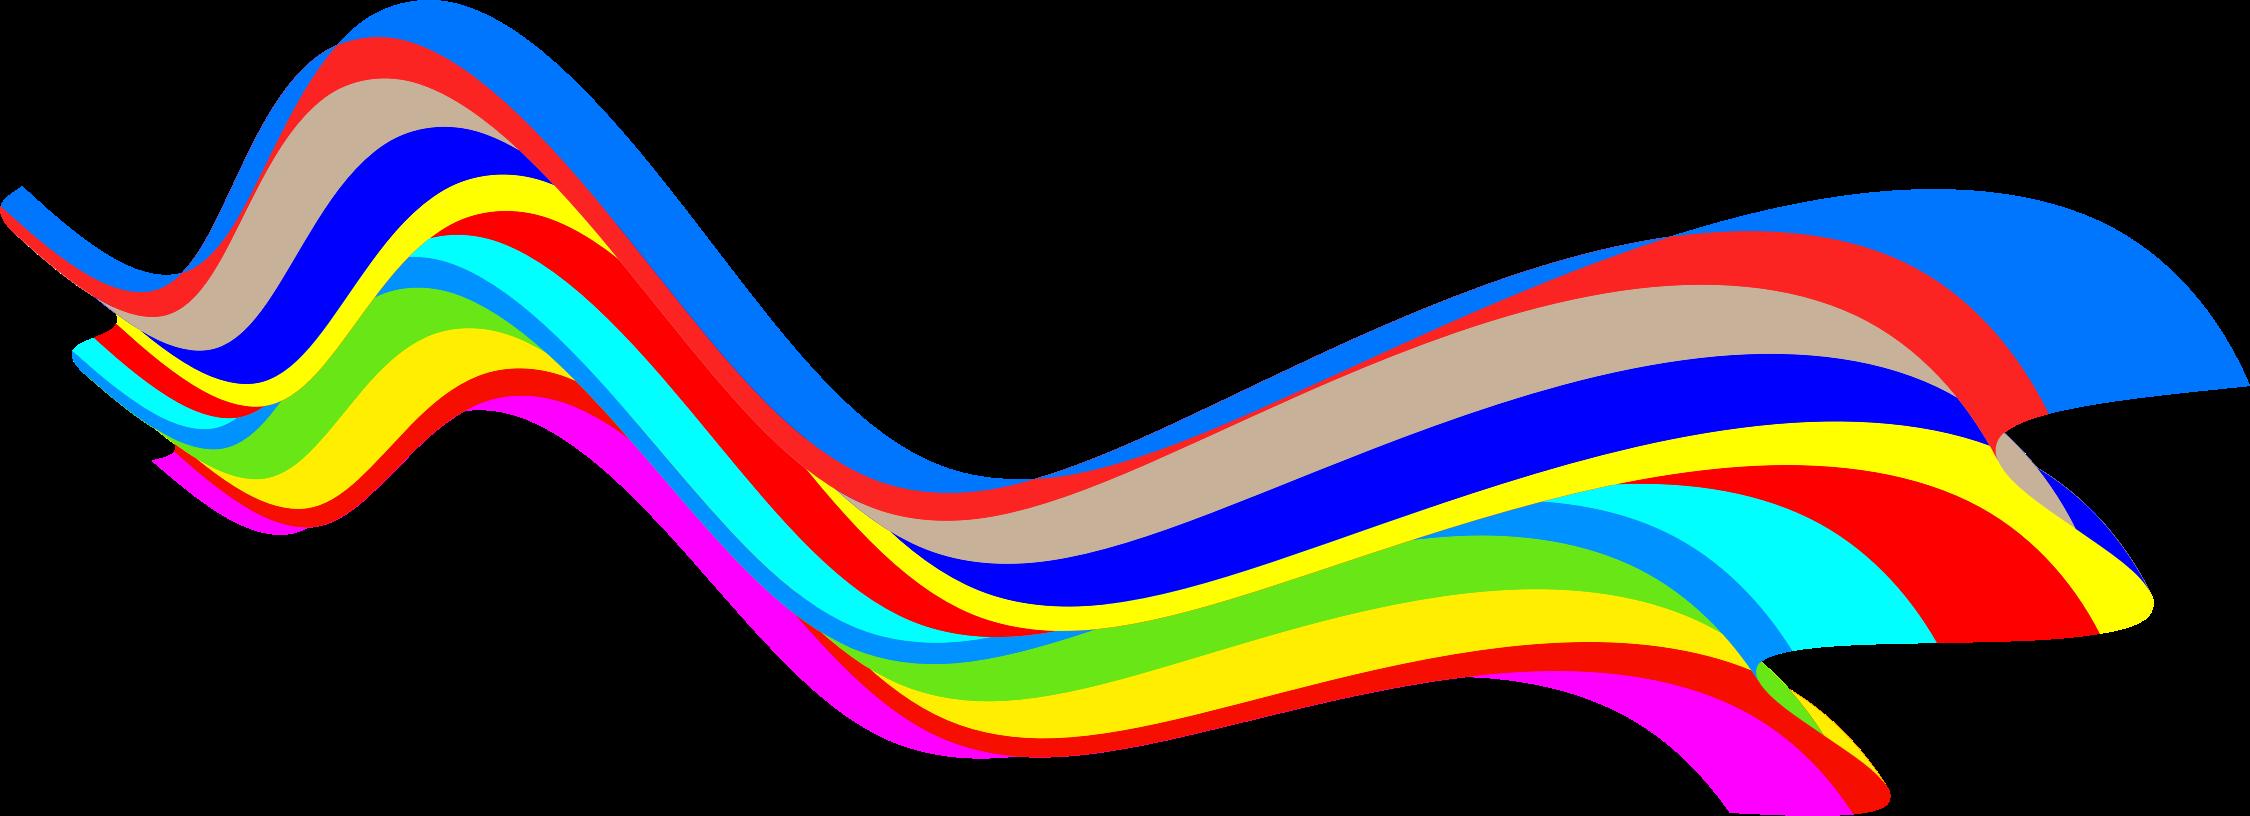 Waves clipart rainbow. Wave motif big image